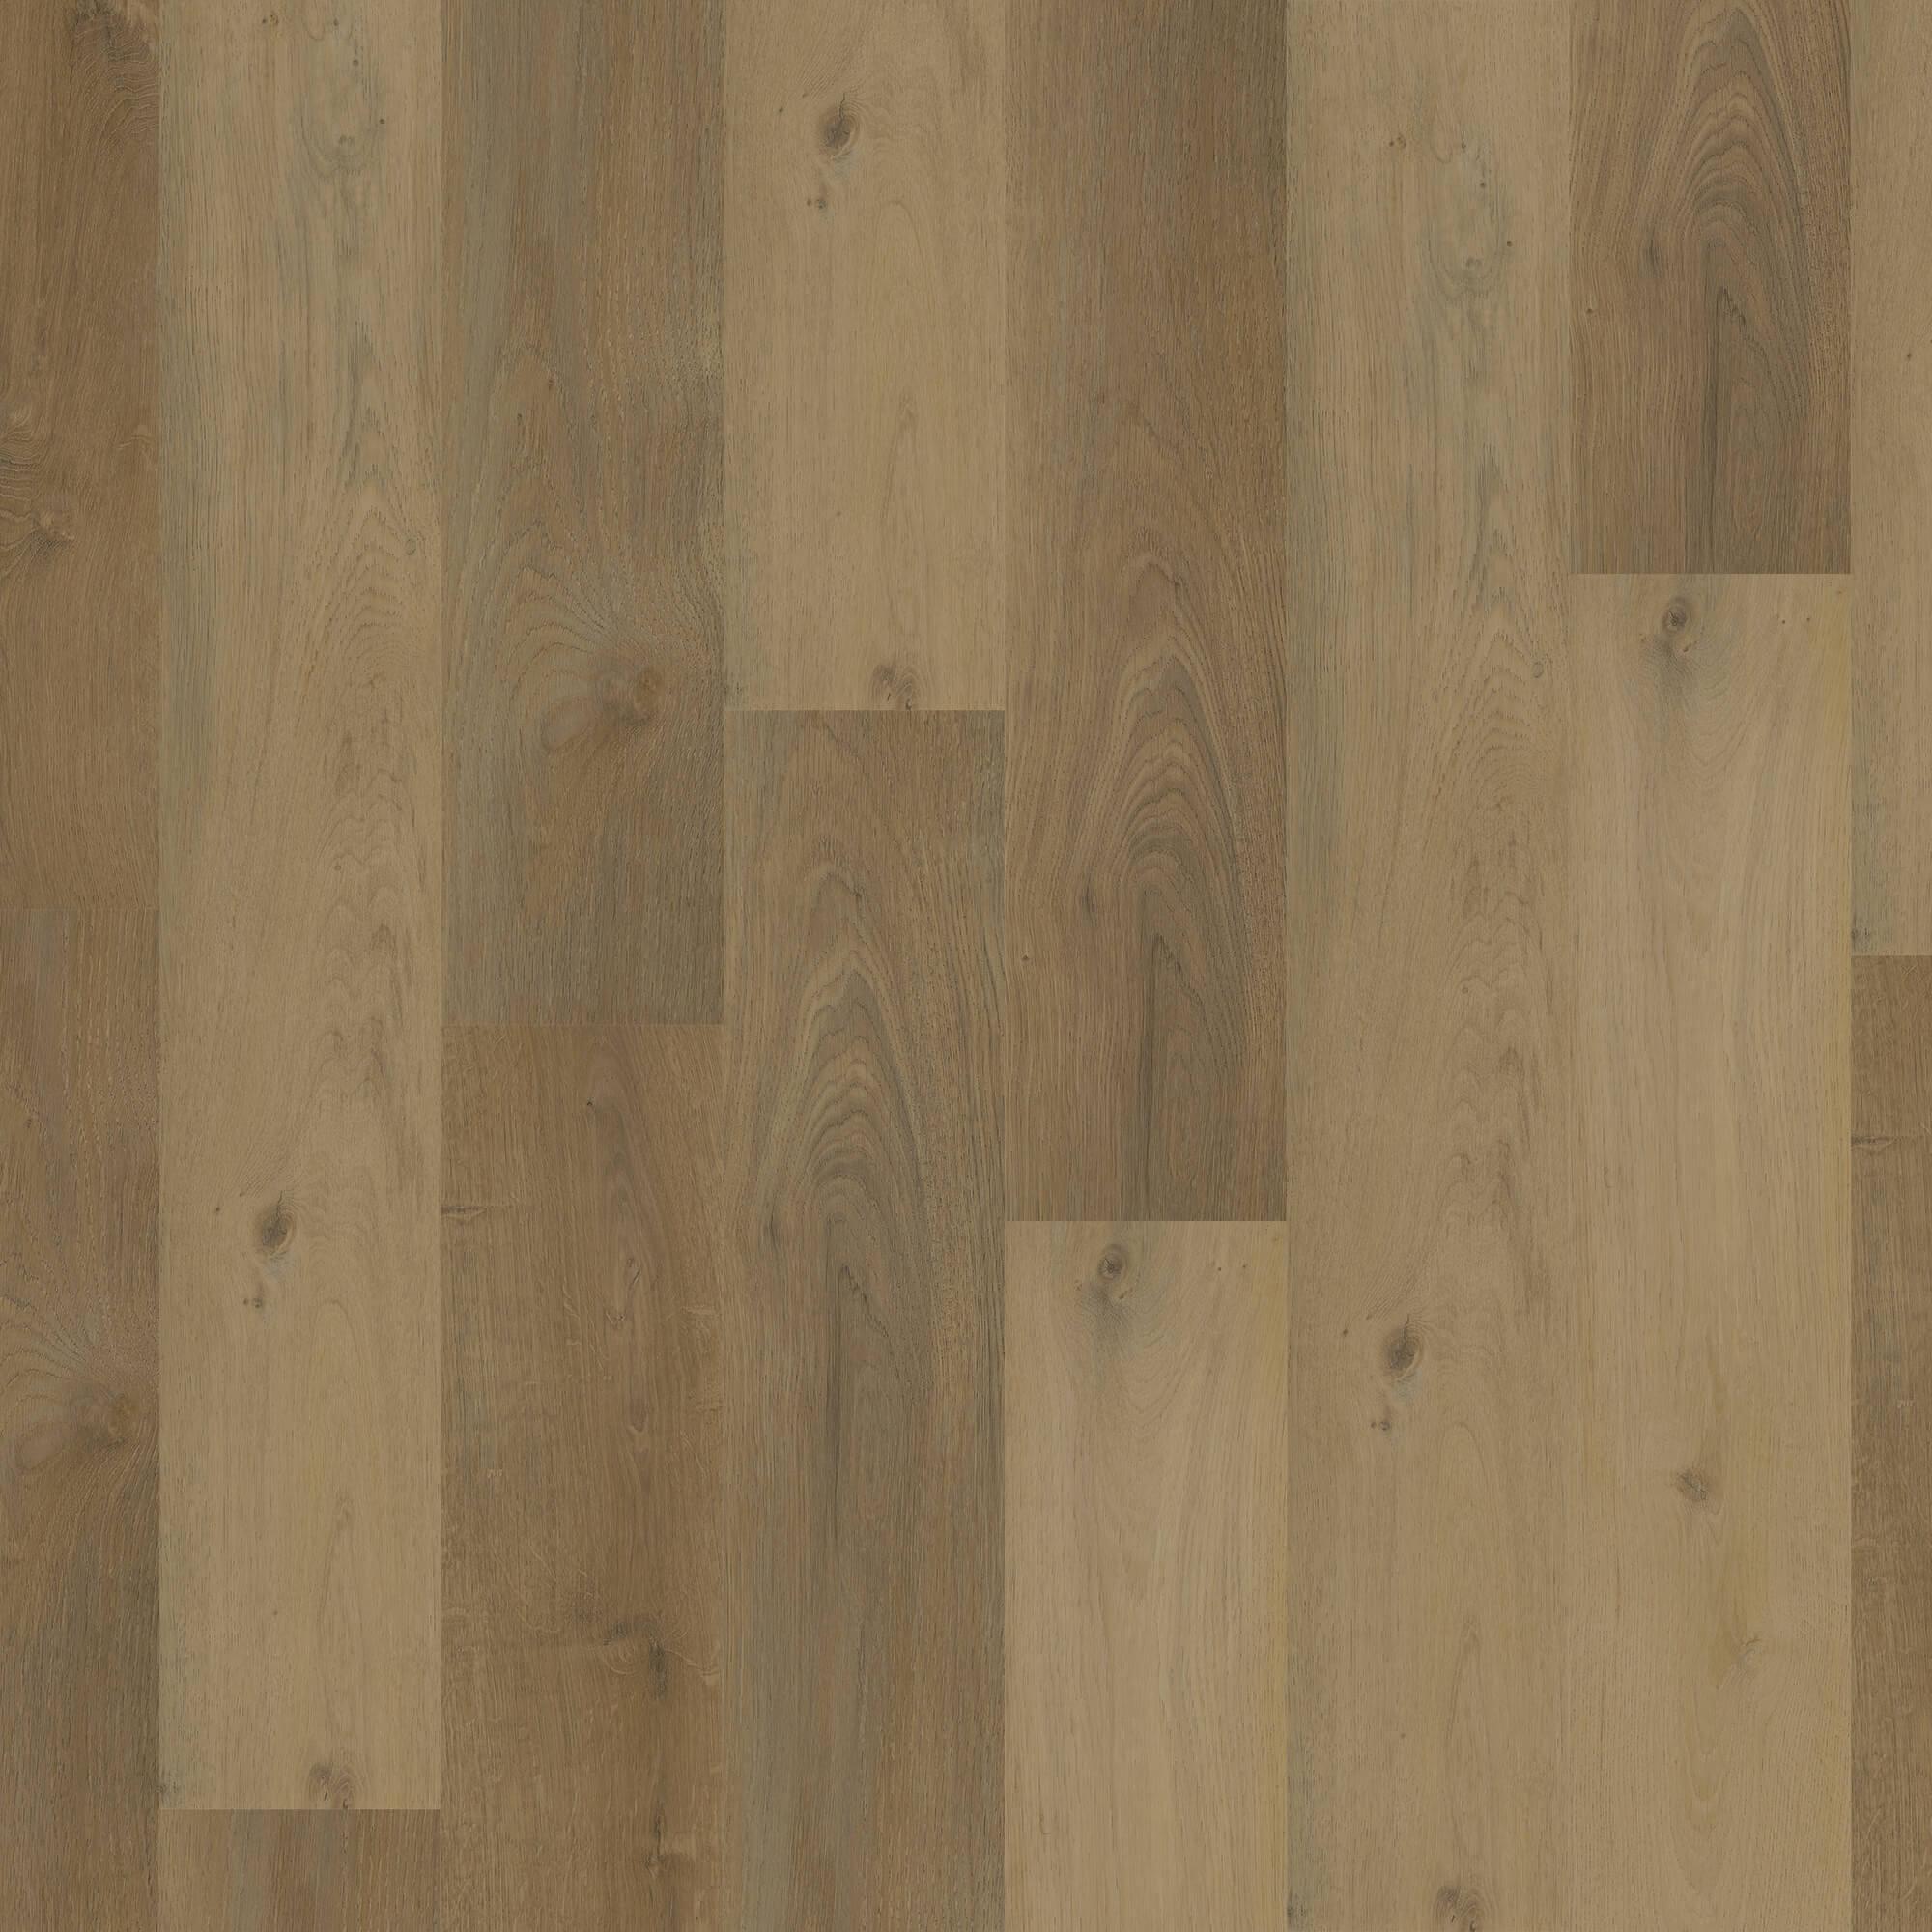 Vinyl Flooring Company Earthwerks